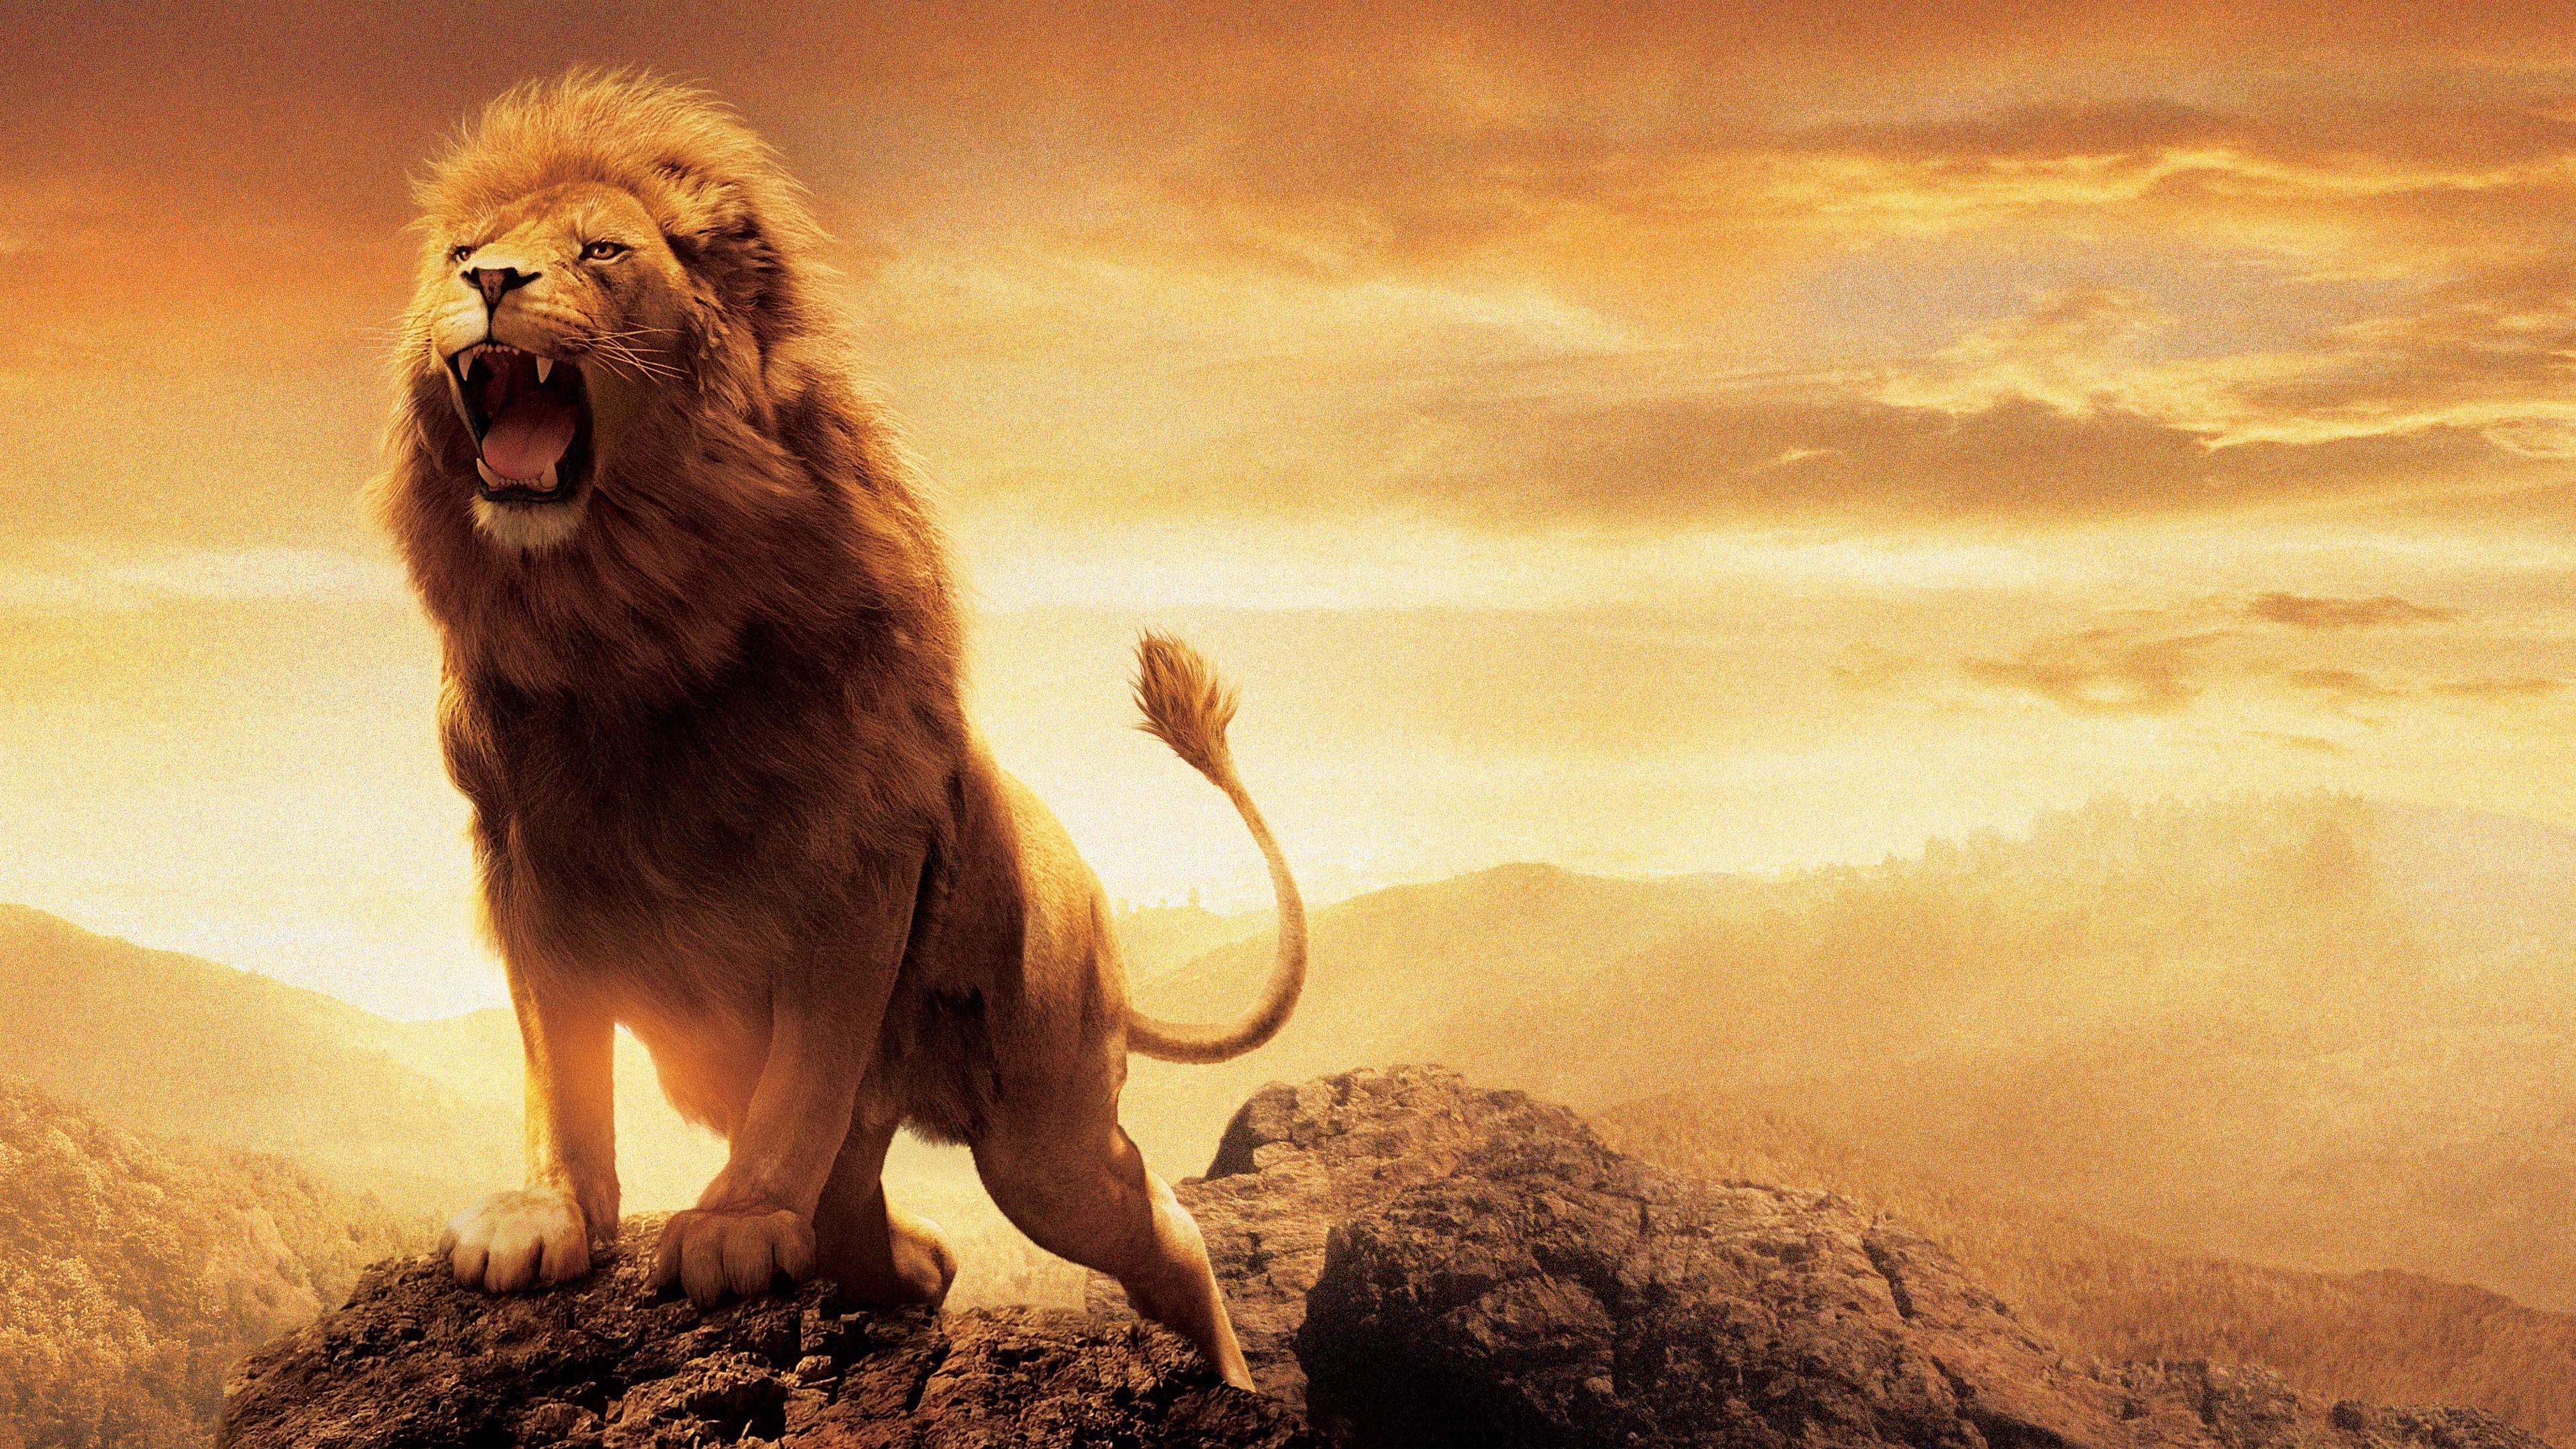 Lion Wallpaper By Shingala Avi On List Lion Live Wallpaper Lion